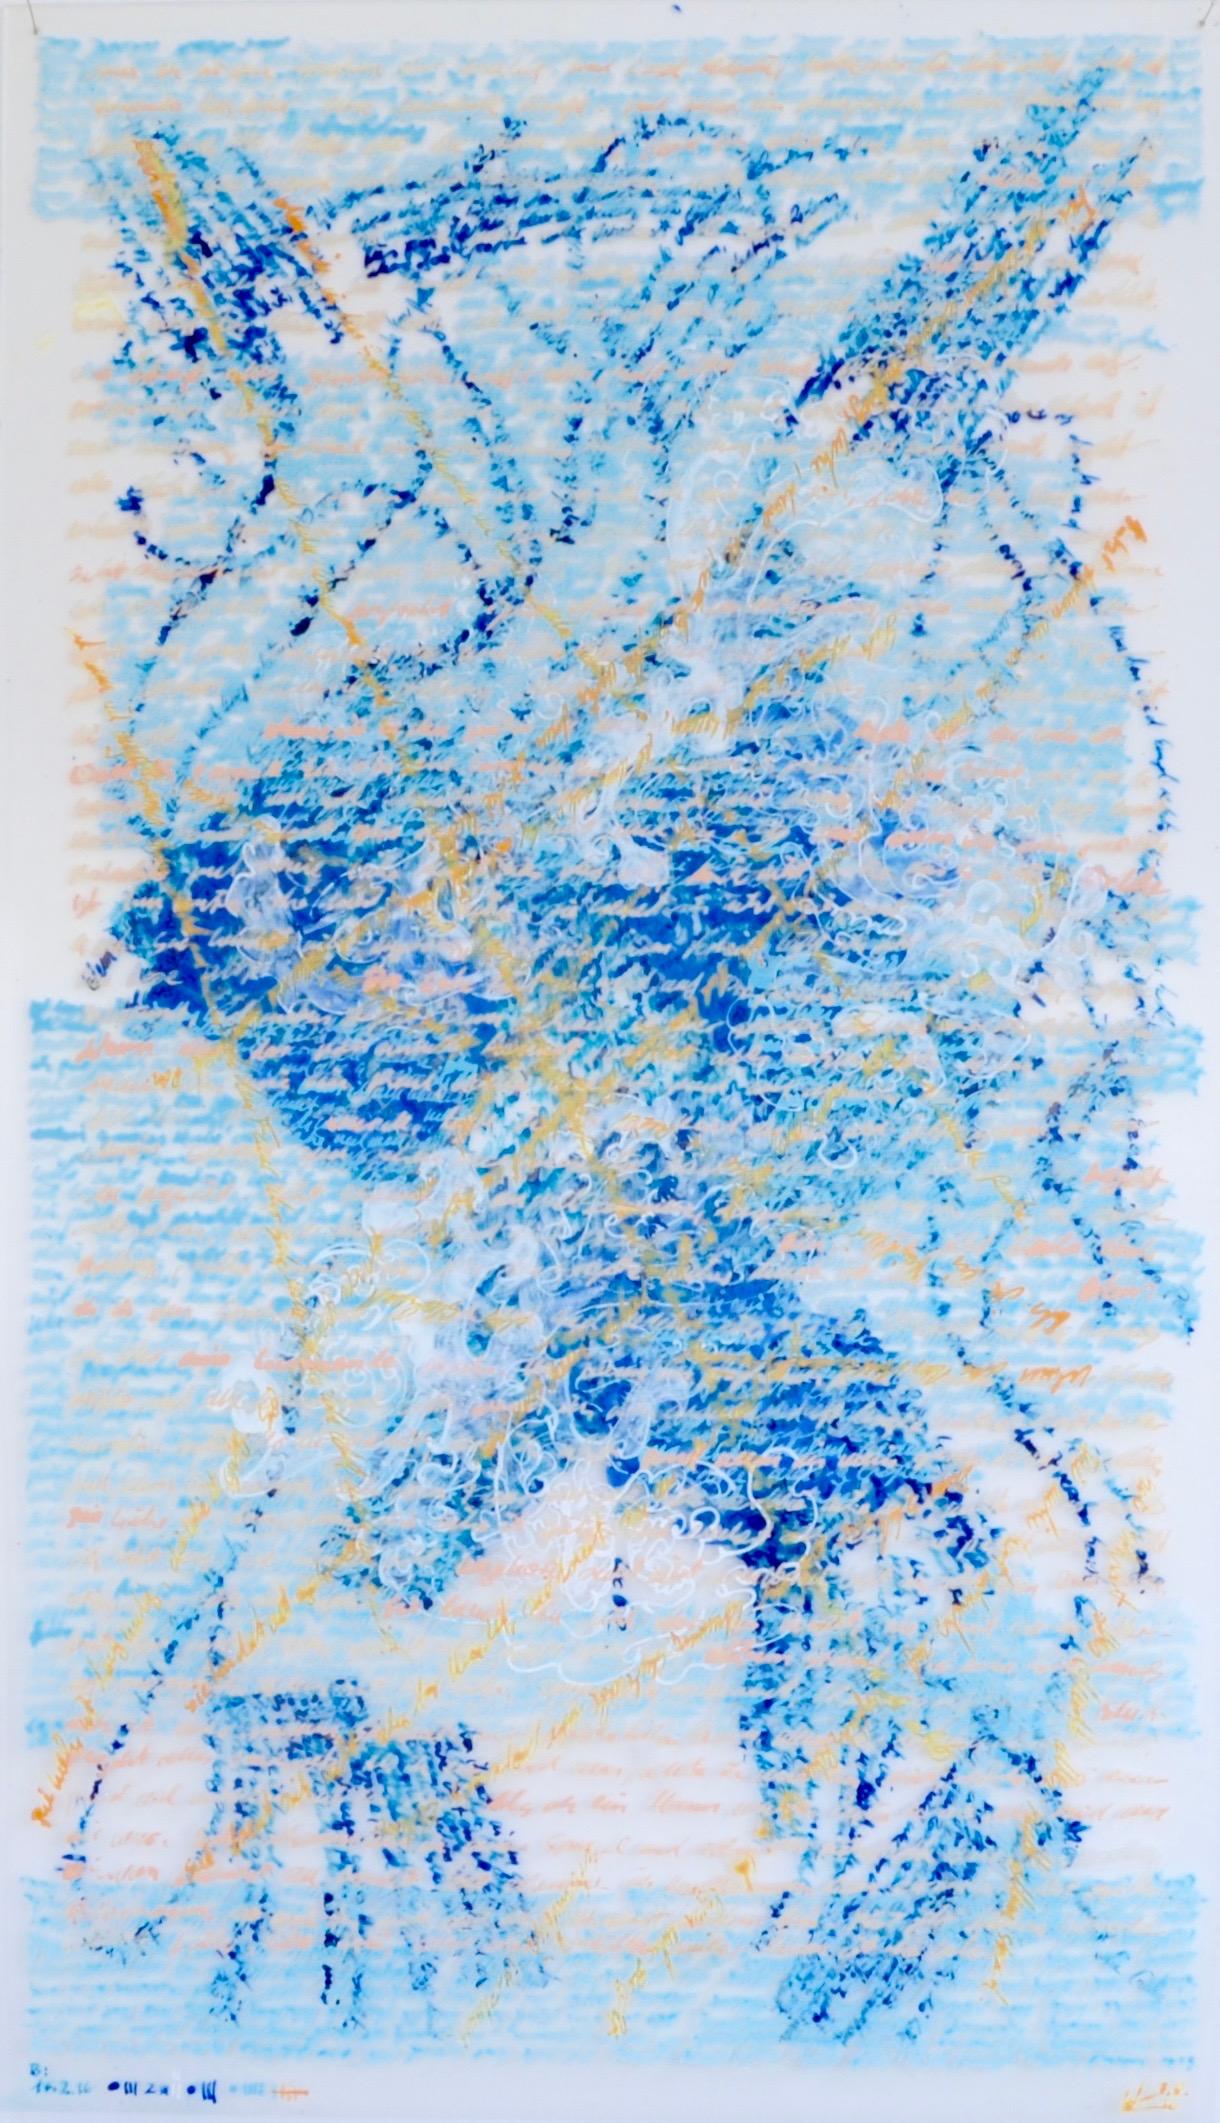 M Kor. 1/13 Meditation 6 38 x 54